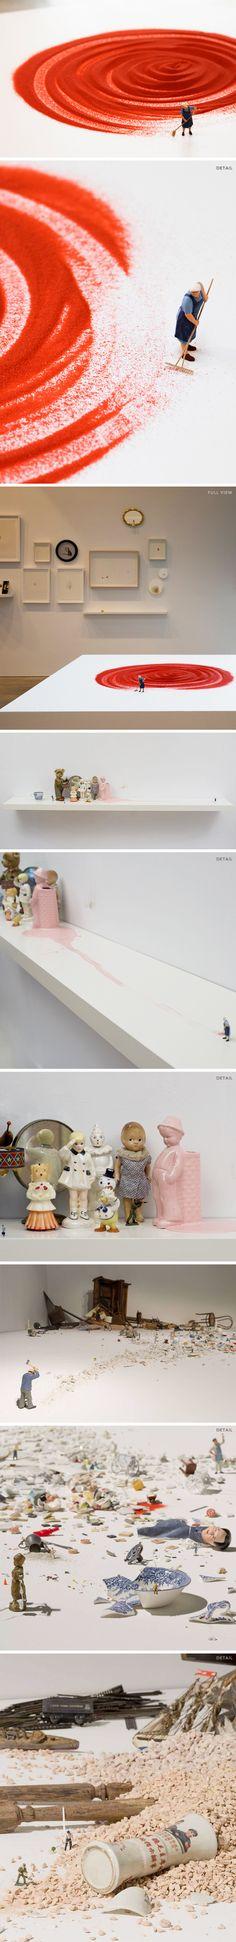 installations by liliana porter